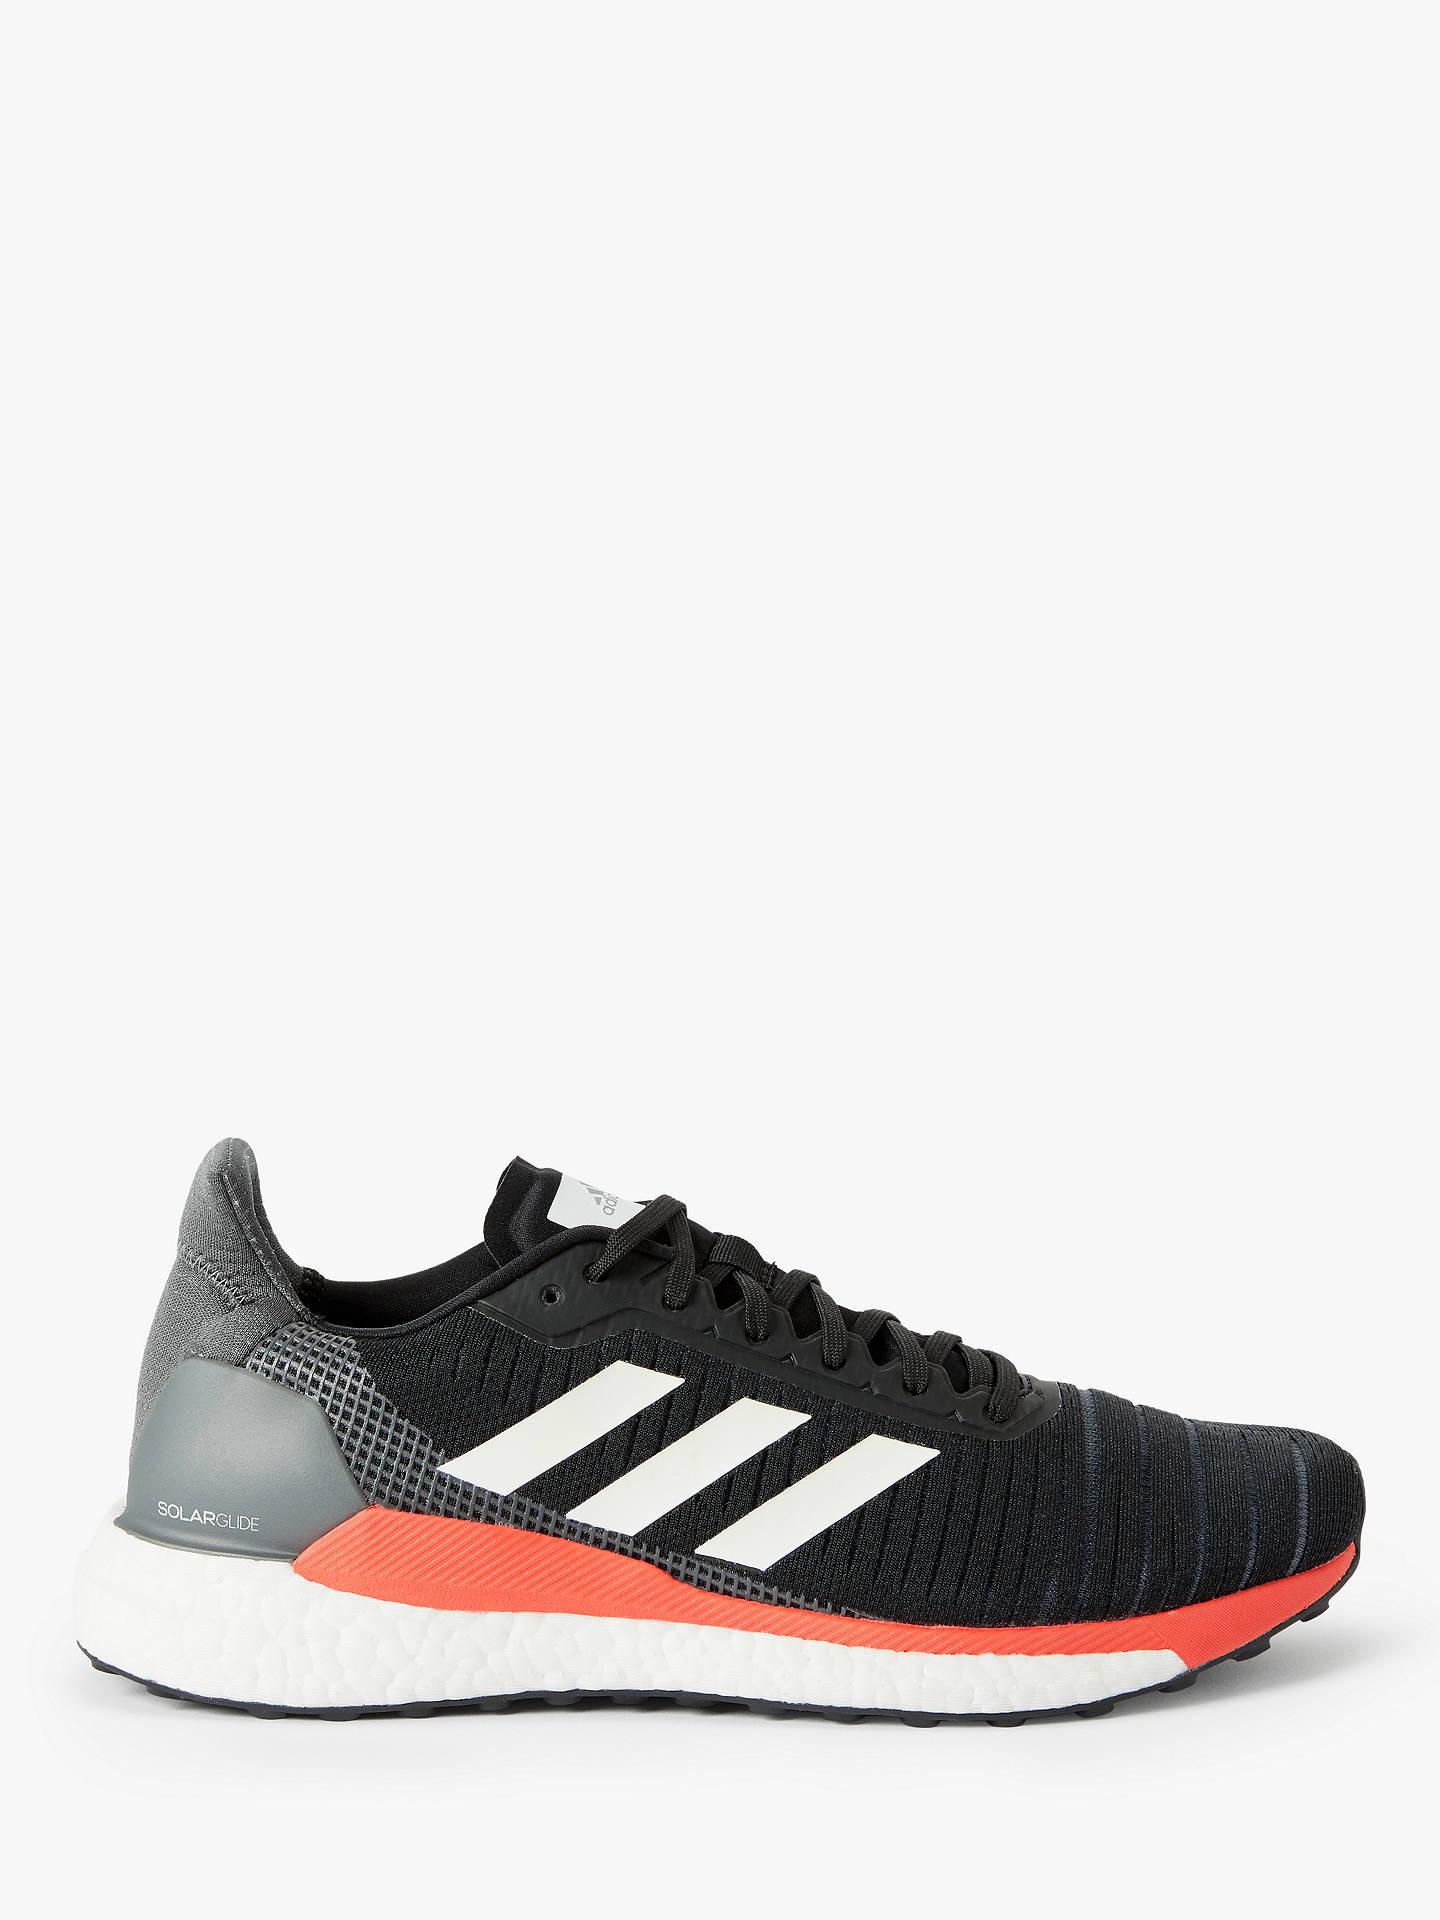 adidas Solar Glide 19 Men's Running Shoes, Core BlackFTWR WhiteSolar Orange